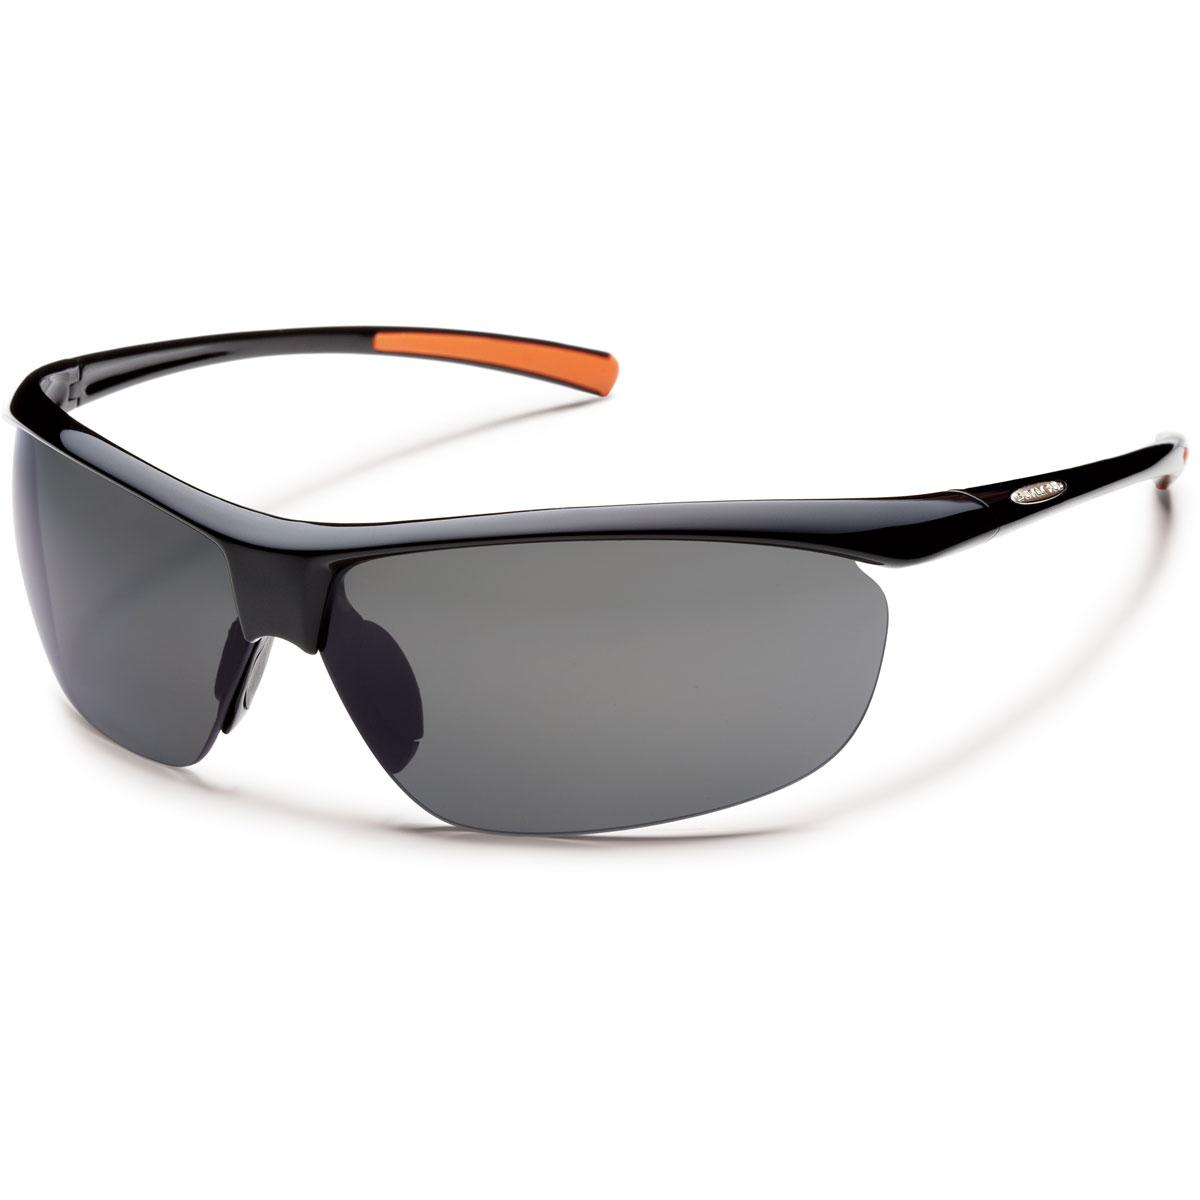 Suncloud Zephyr Polarized Sunglasses - Color: Black - Grey Lens, Black - Grey Lens, large, image 1